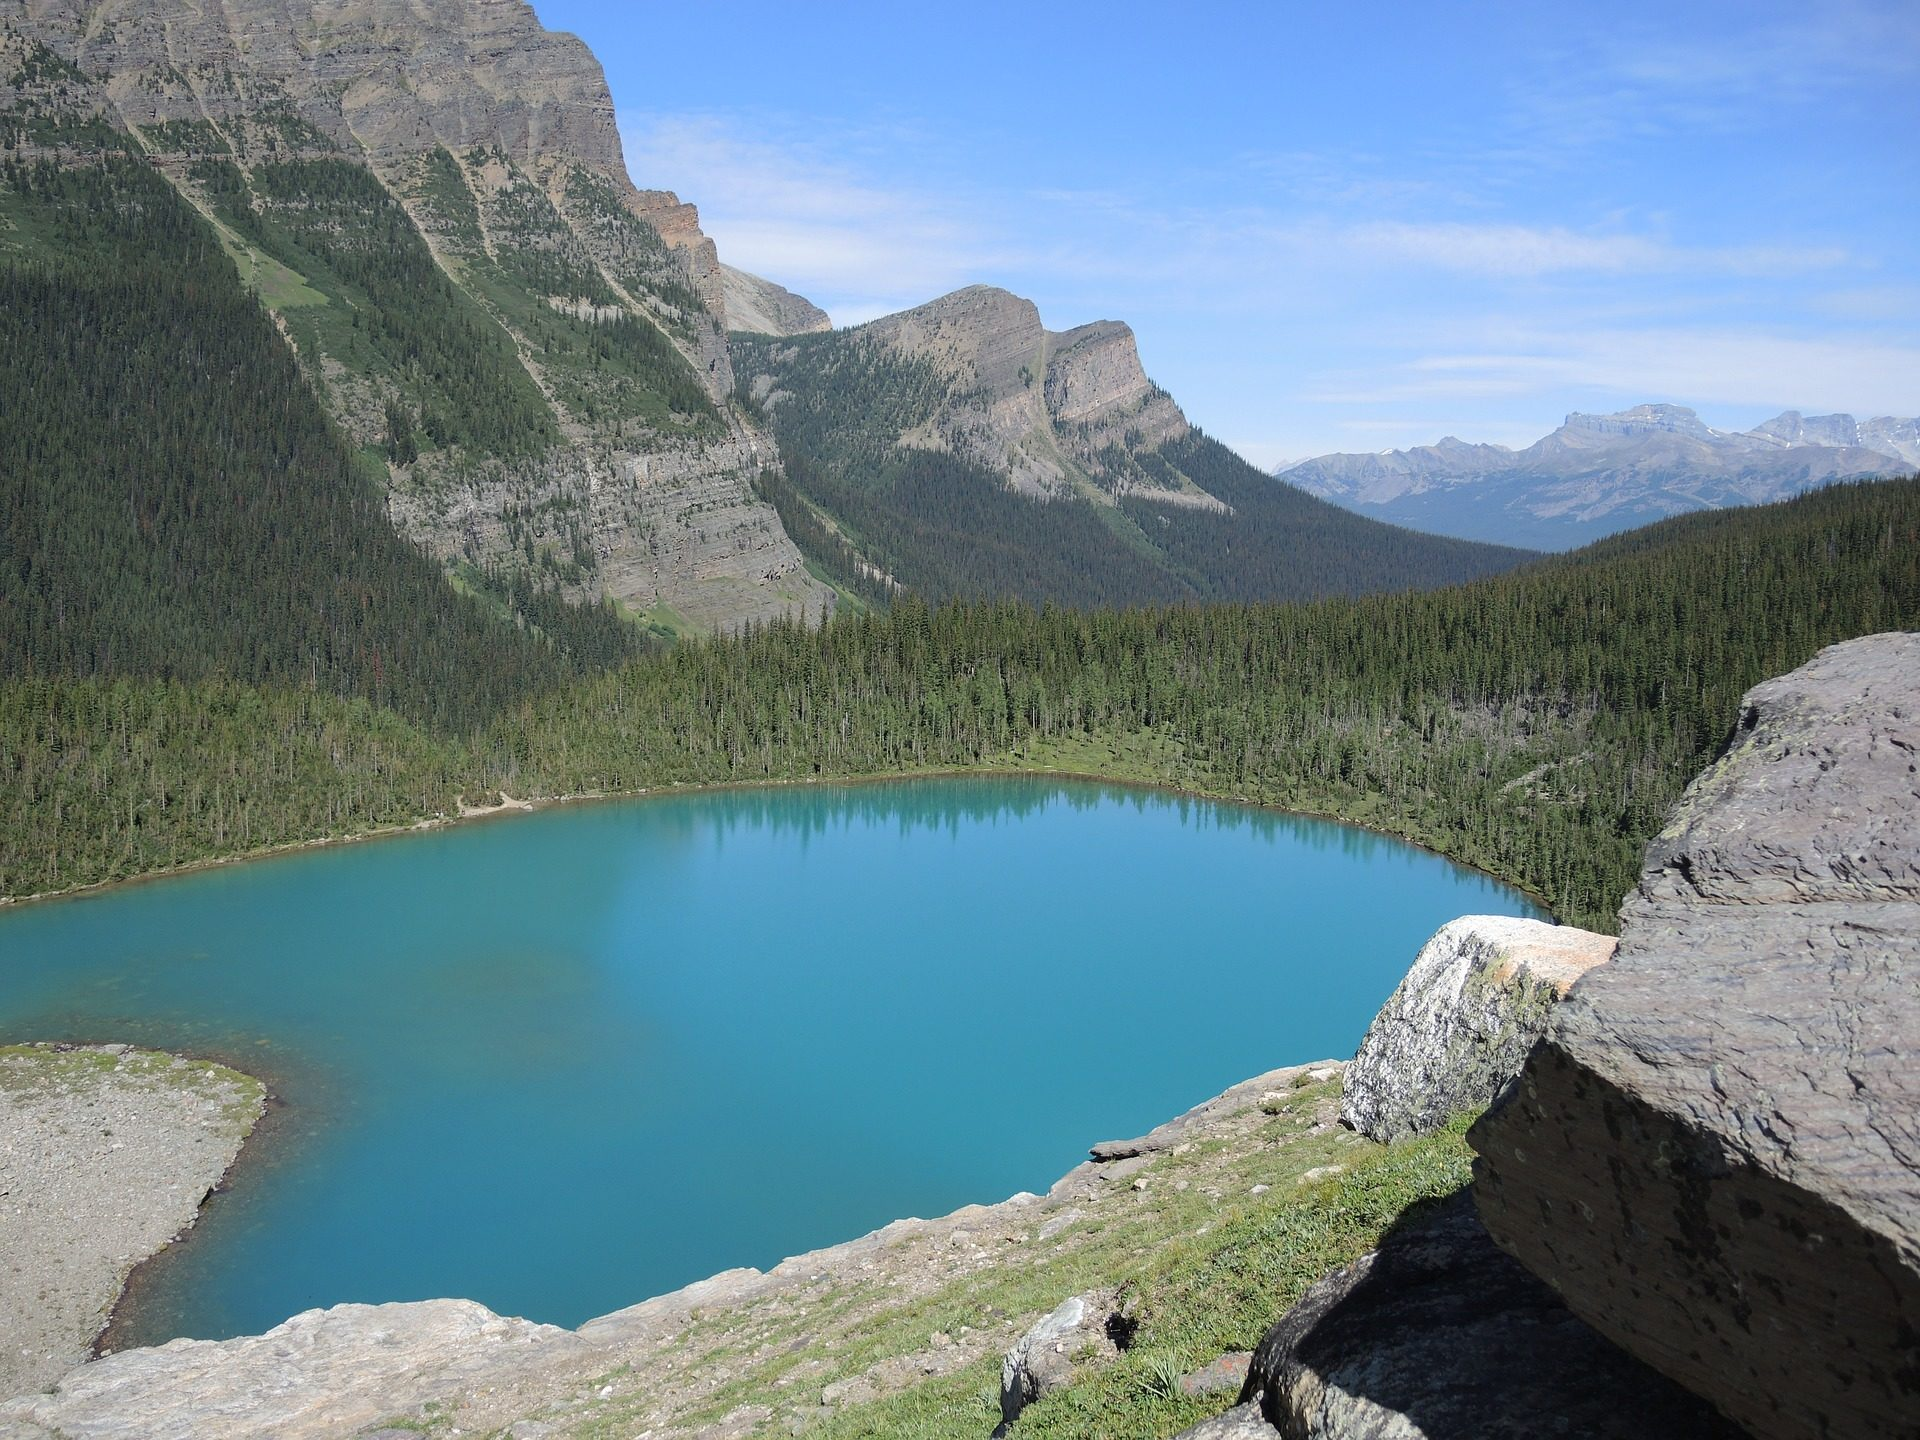 Lake, Montañas, Forest, Laguna, Turquoise, luxuriant - Fonds d'écran HD - Professor-falken.com